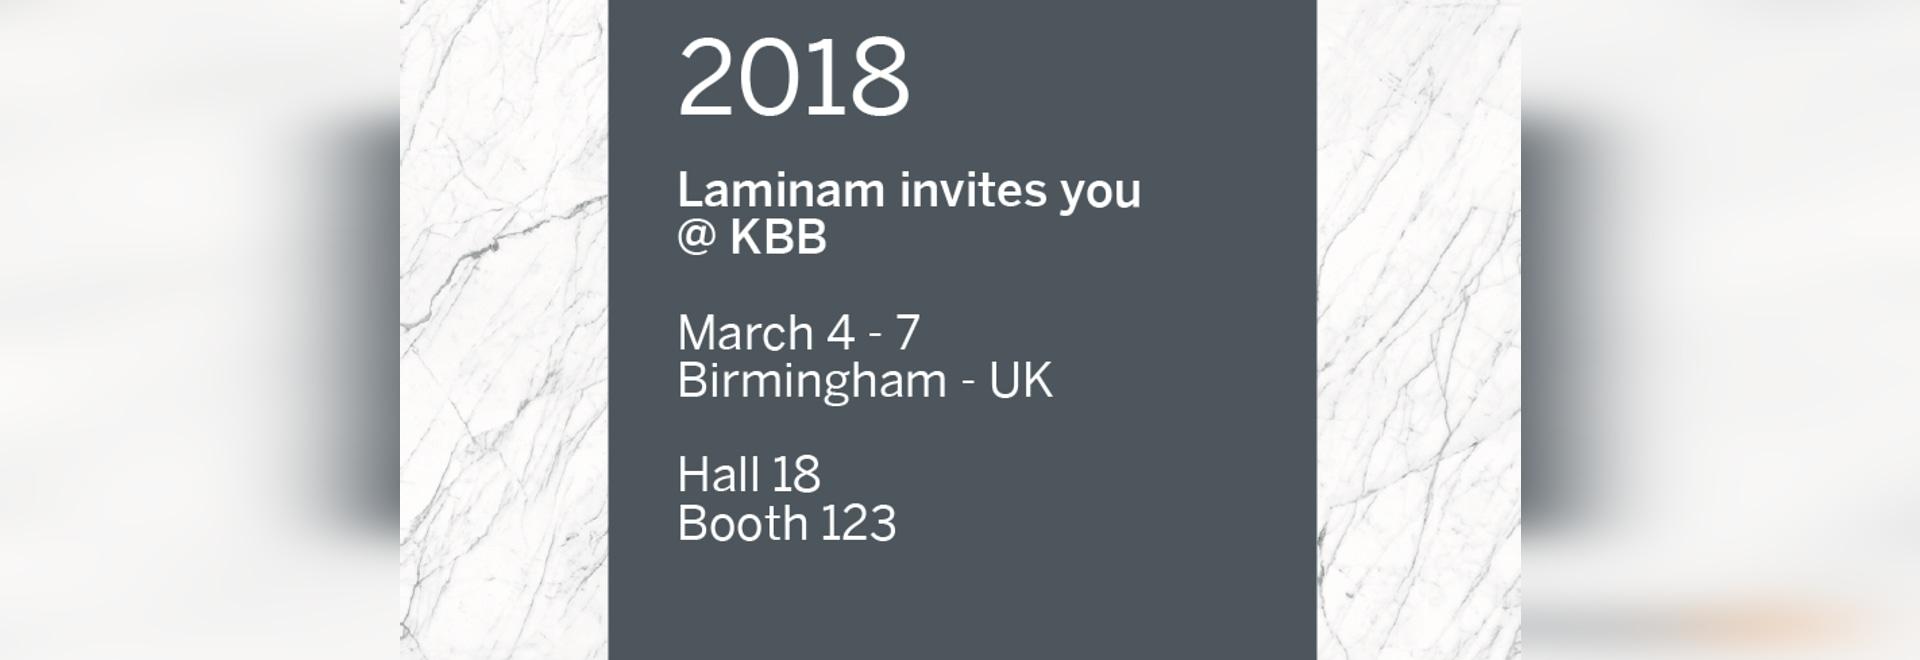 LARGE LAMINAM CERAMIC SURFACES FOR FURNISHINGS AT KBB BIRMINGHAM